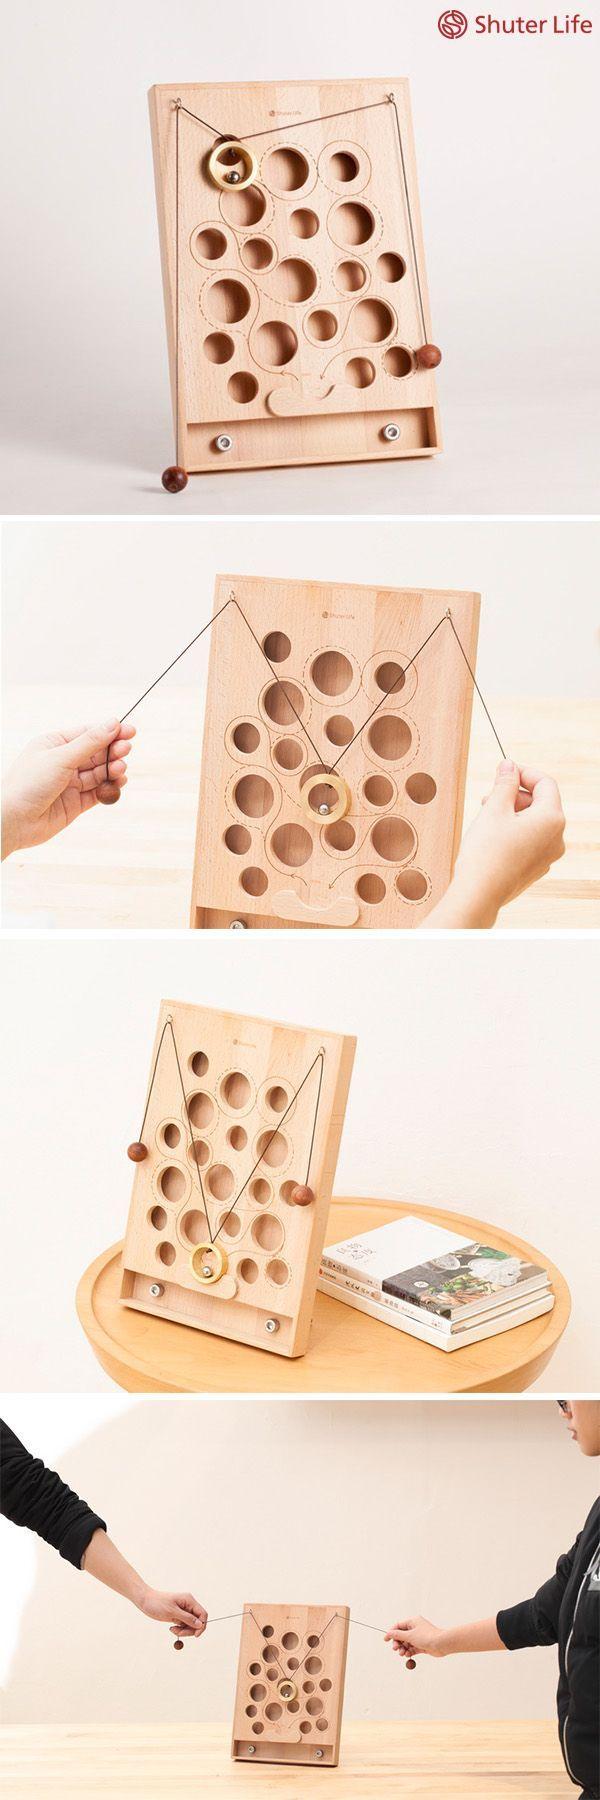 6 Astonishing Useful Ideas: Wood Working Decor How To Build woodworking garden r…